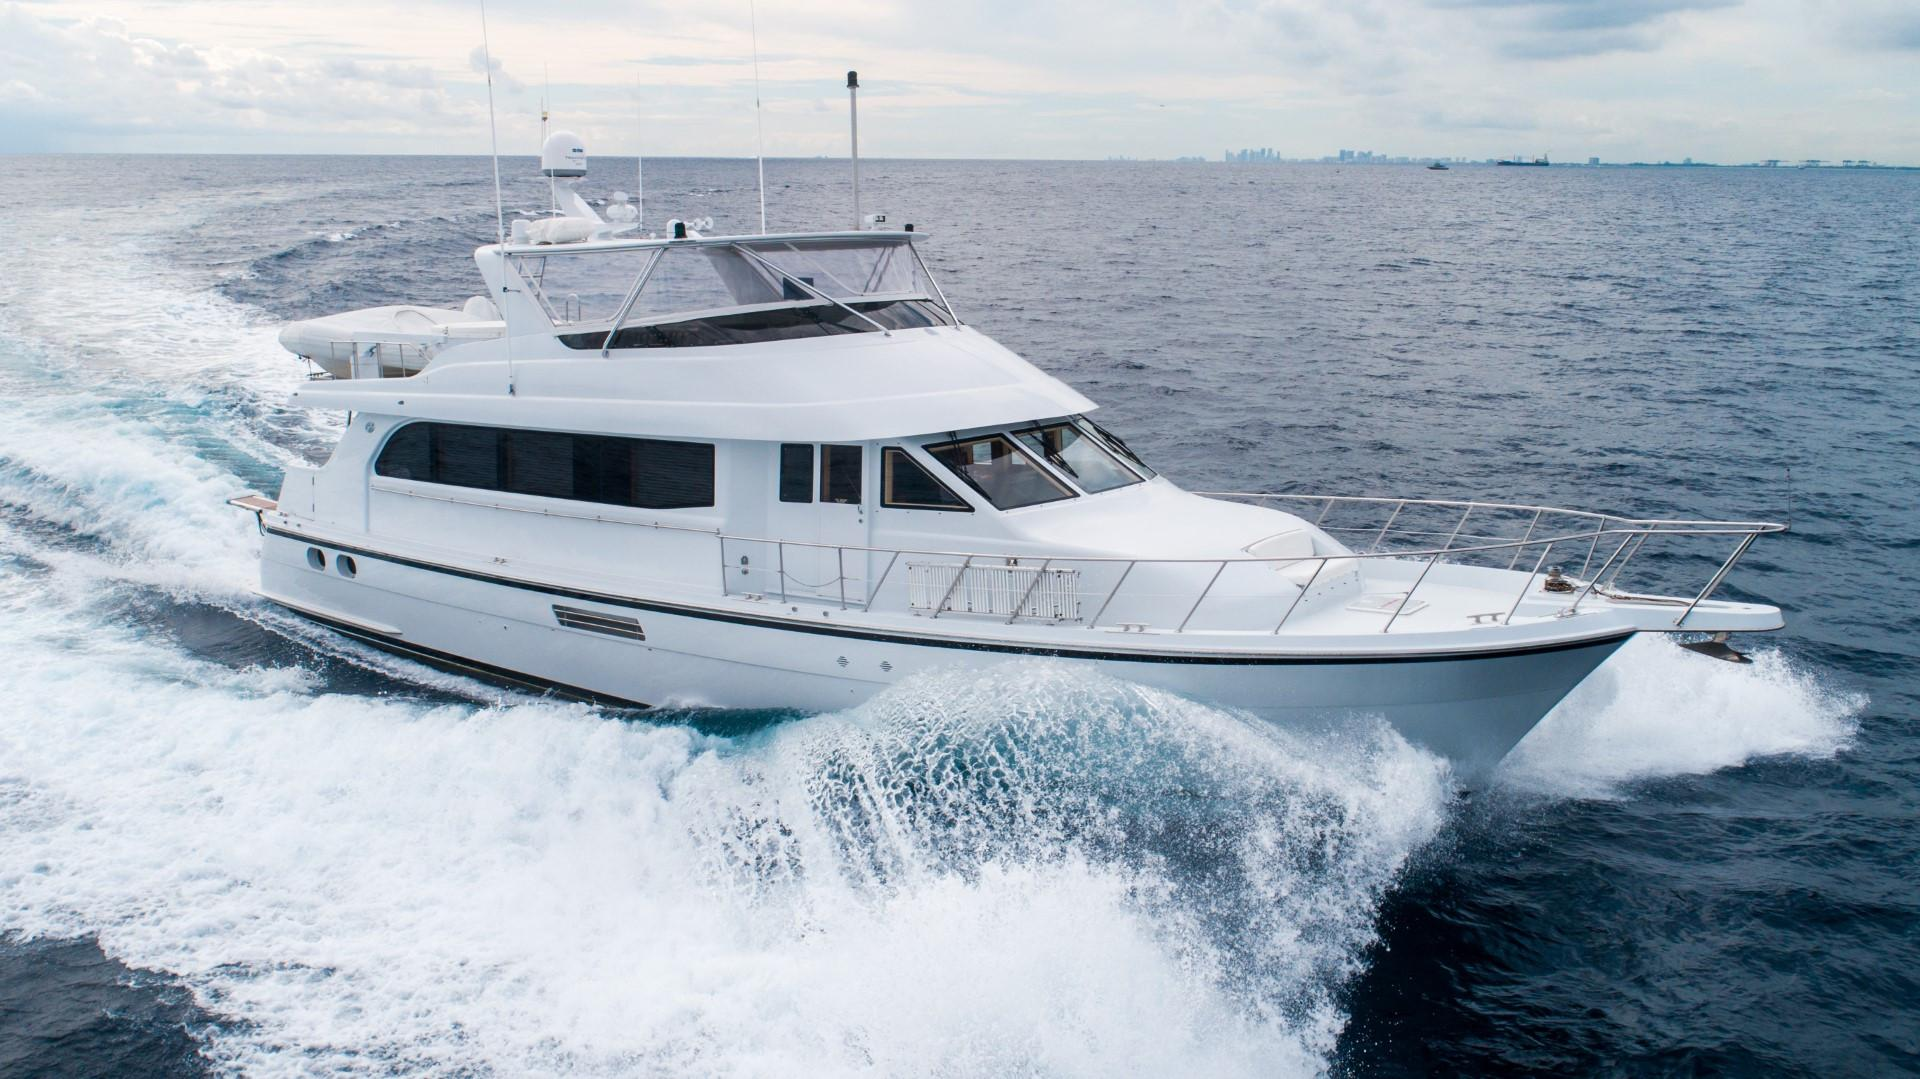 2002 75' Hatteras Motor Yacht - Strbrd Bow